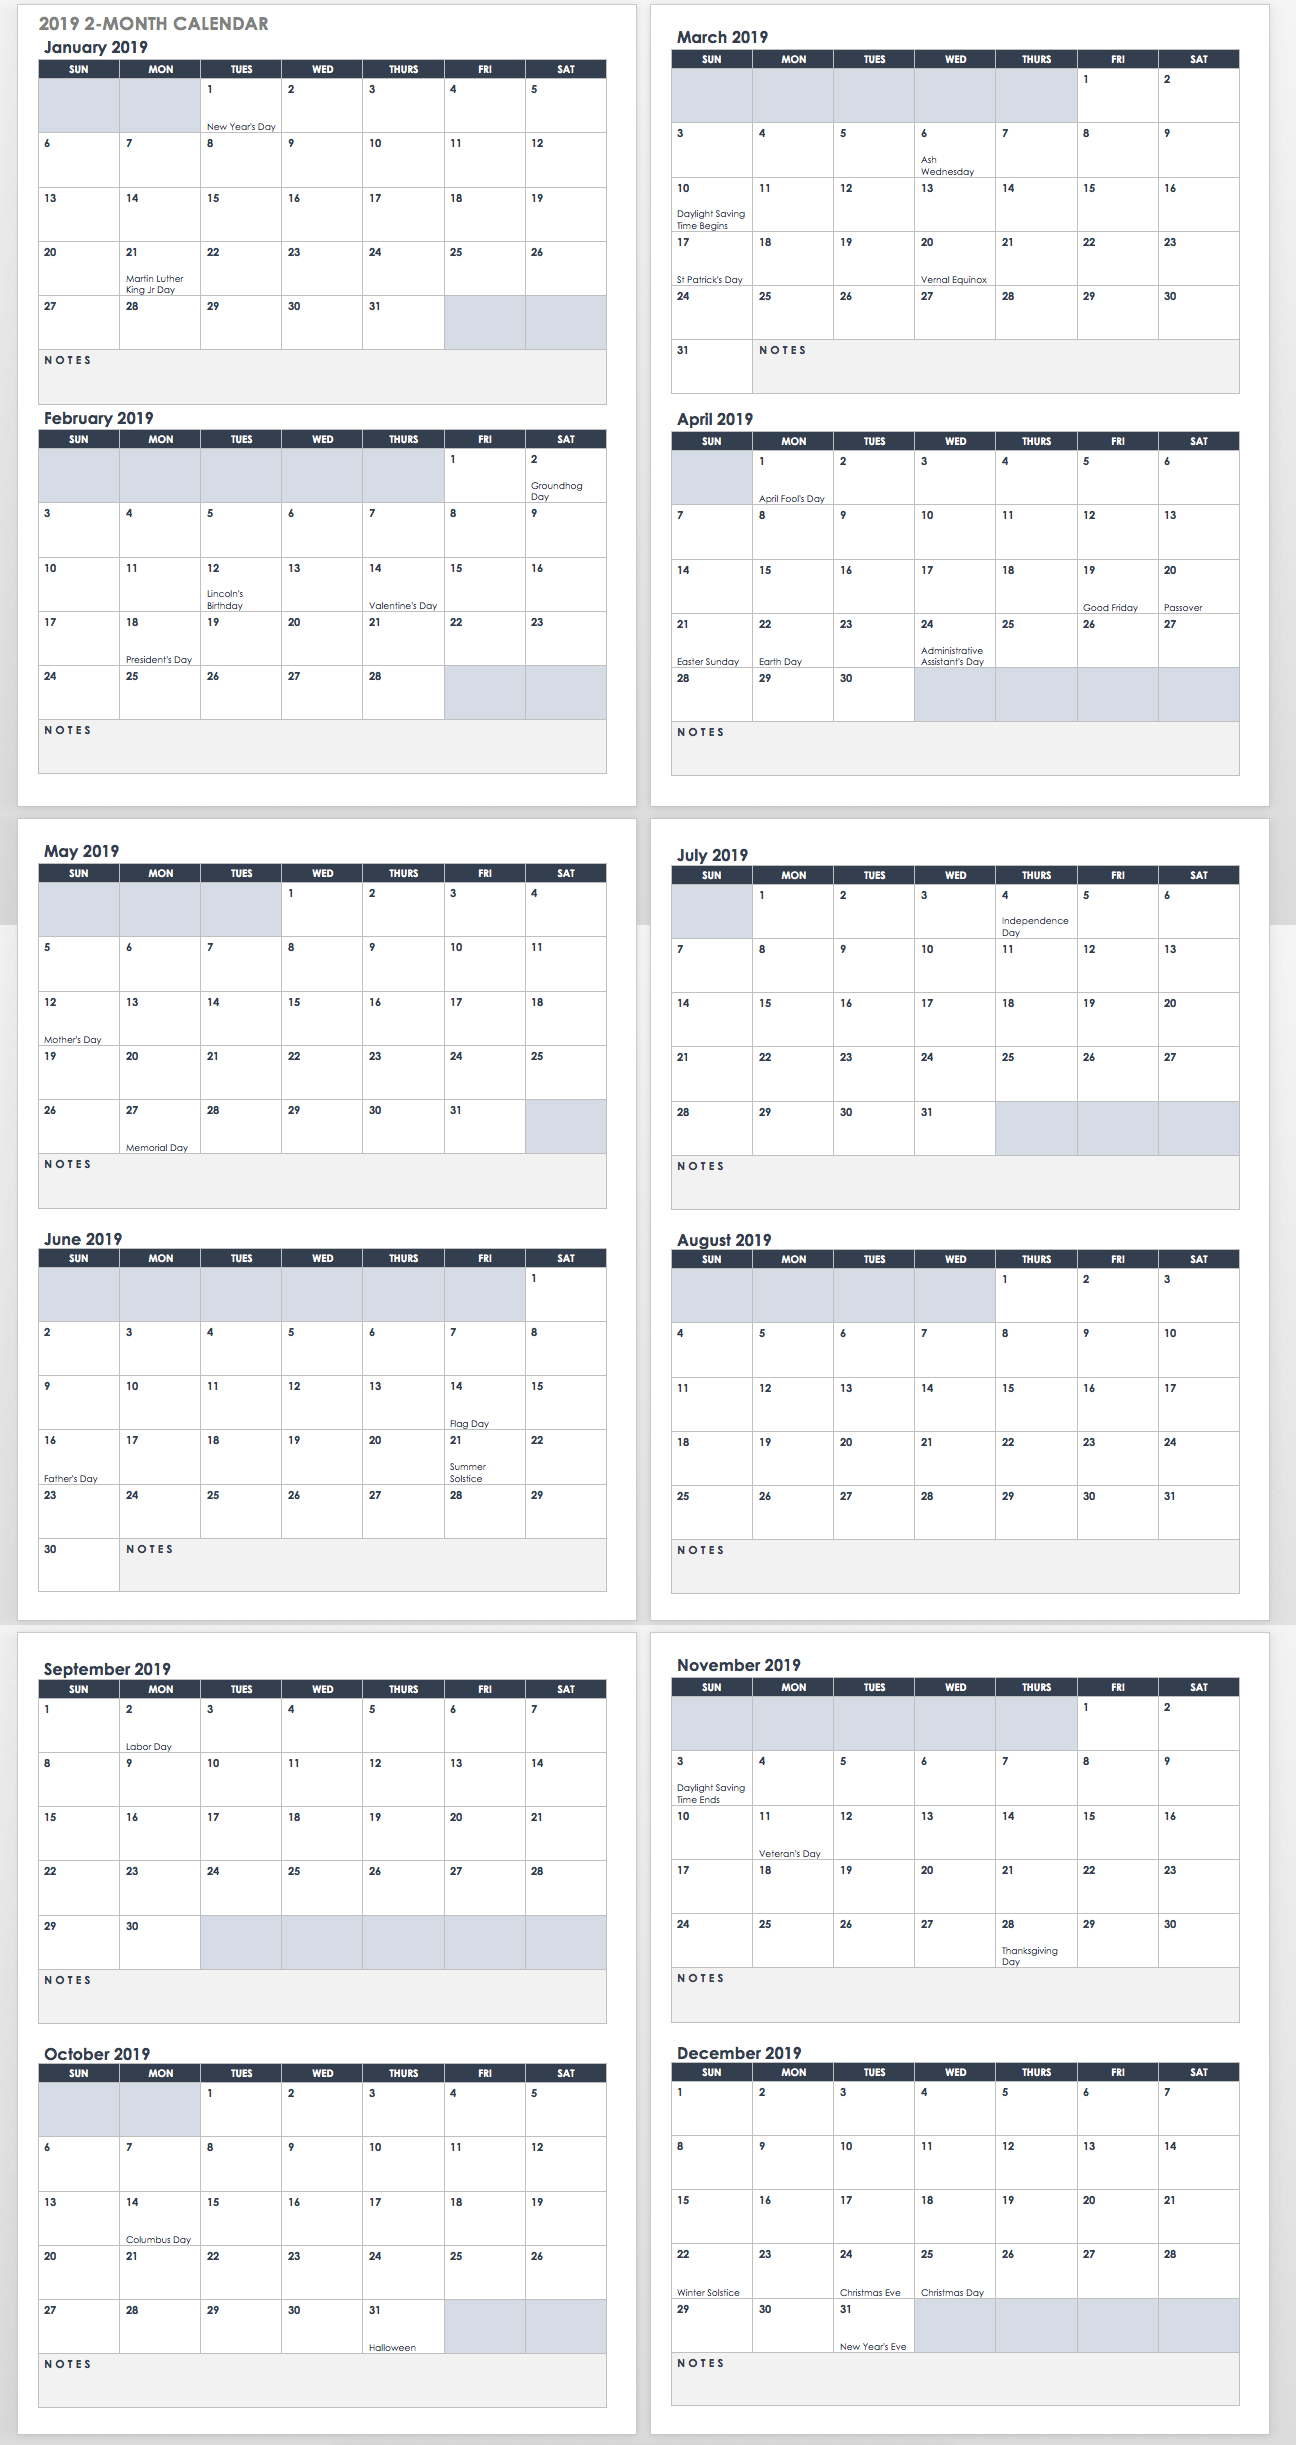 15 Free Monthly Calendar Templates | Smartsheet regarding 12 Month Calendar Template Printable